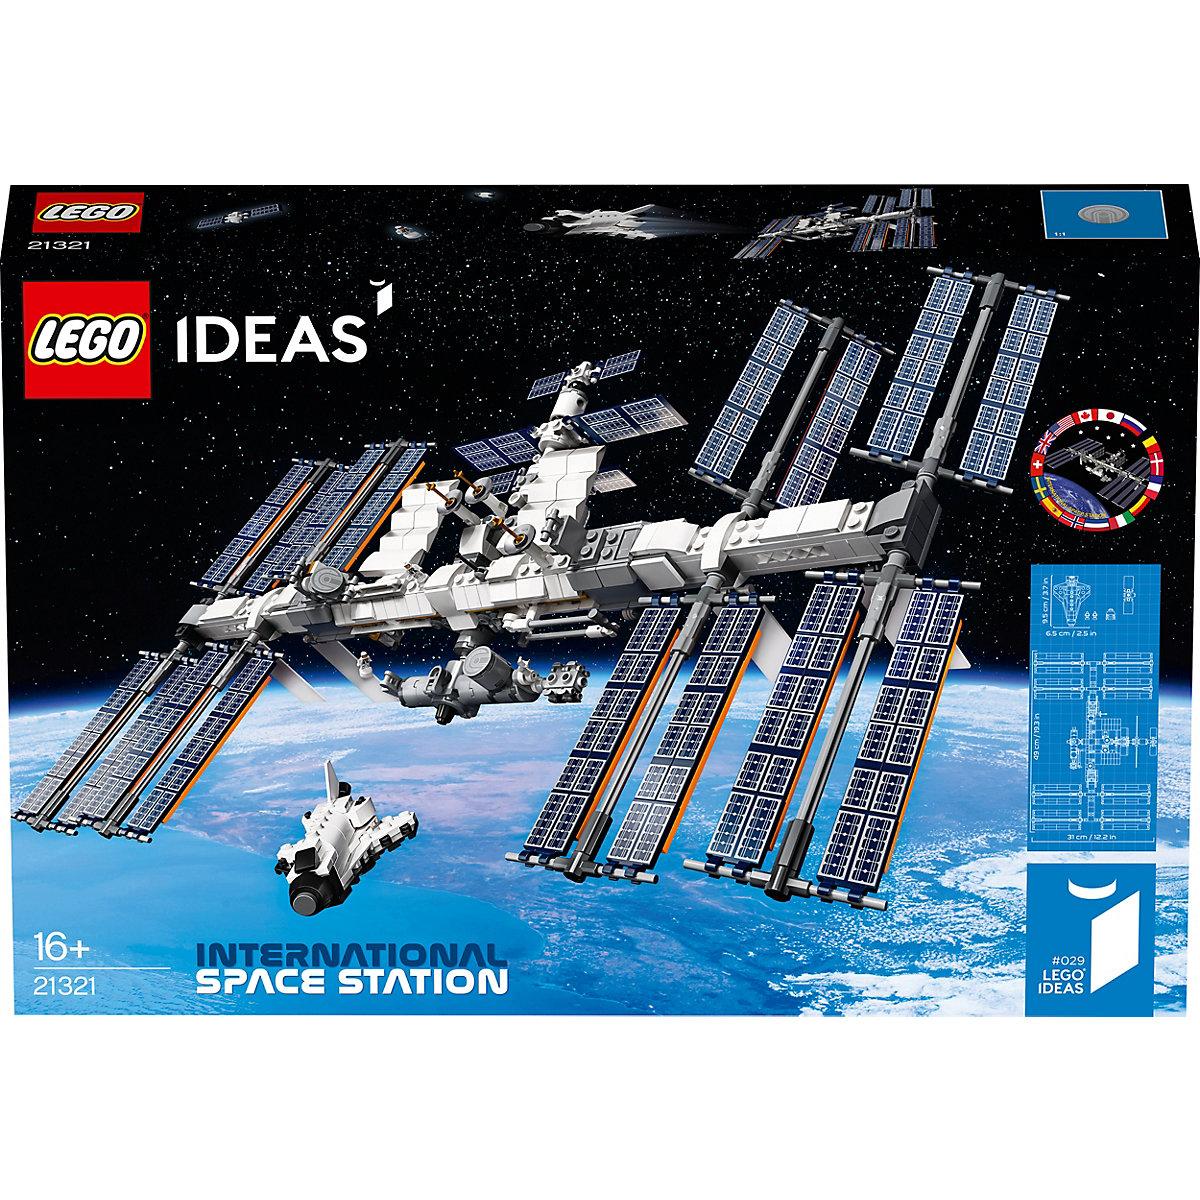 LEGO Ideas 21321 Internationale Raumstation